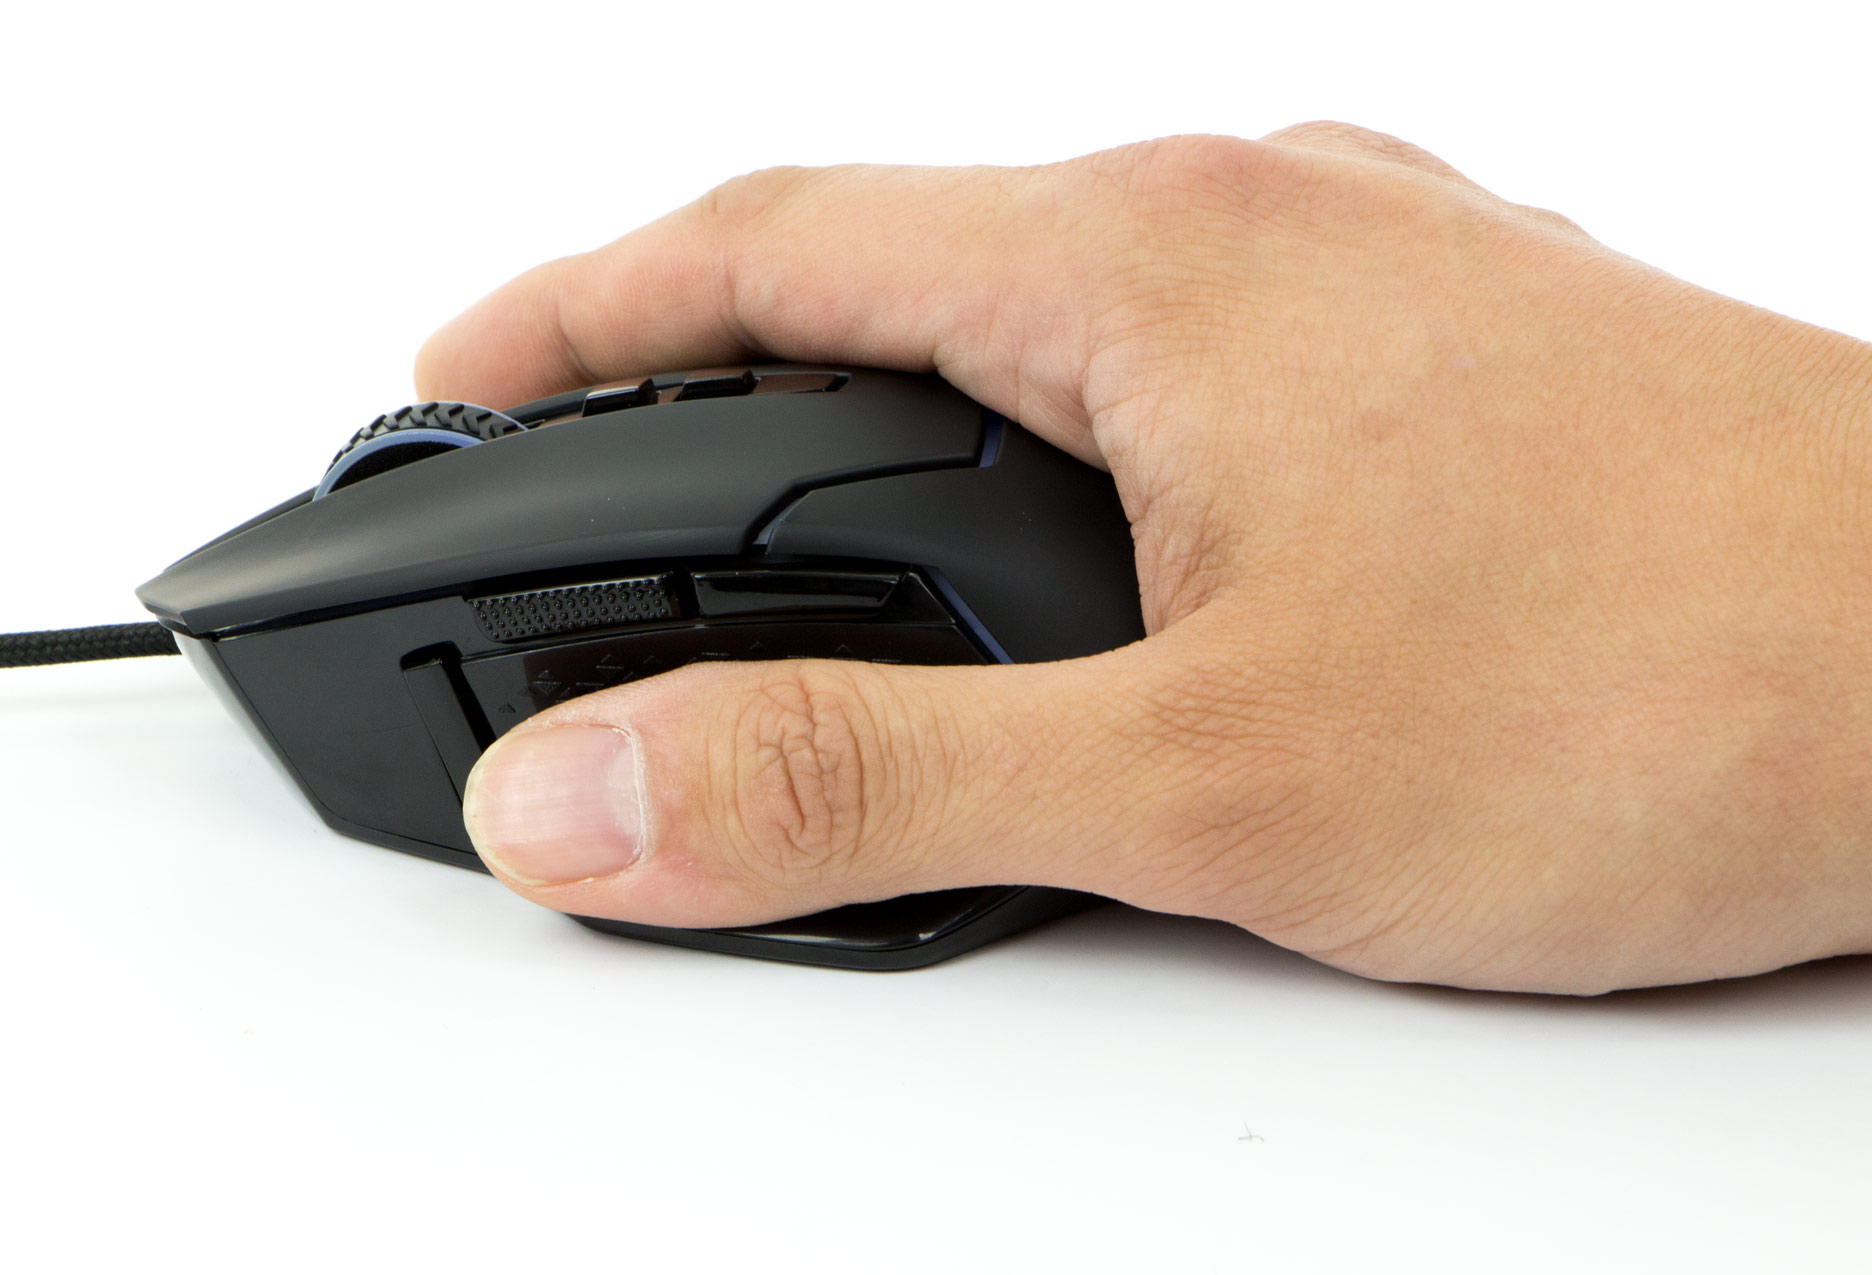 Modecom Volcano MC-GMX4 - w dłoni